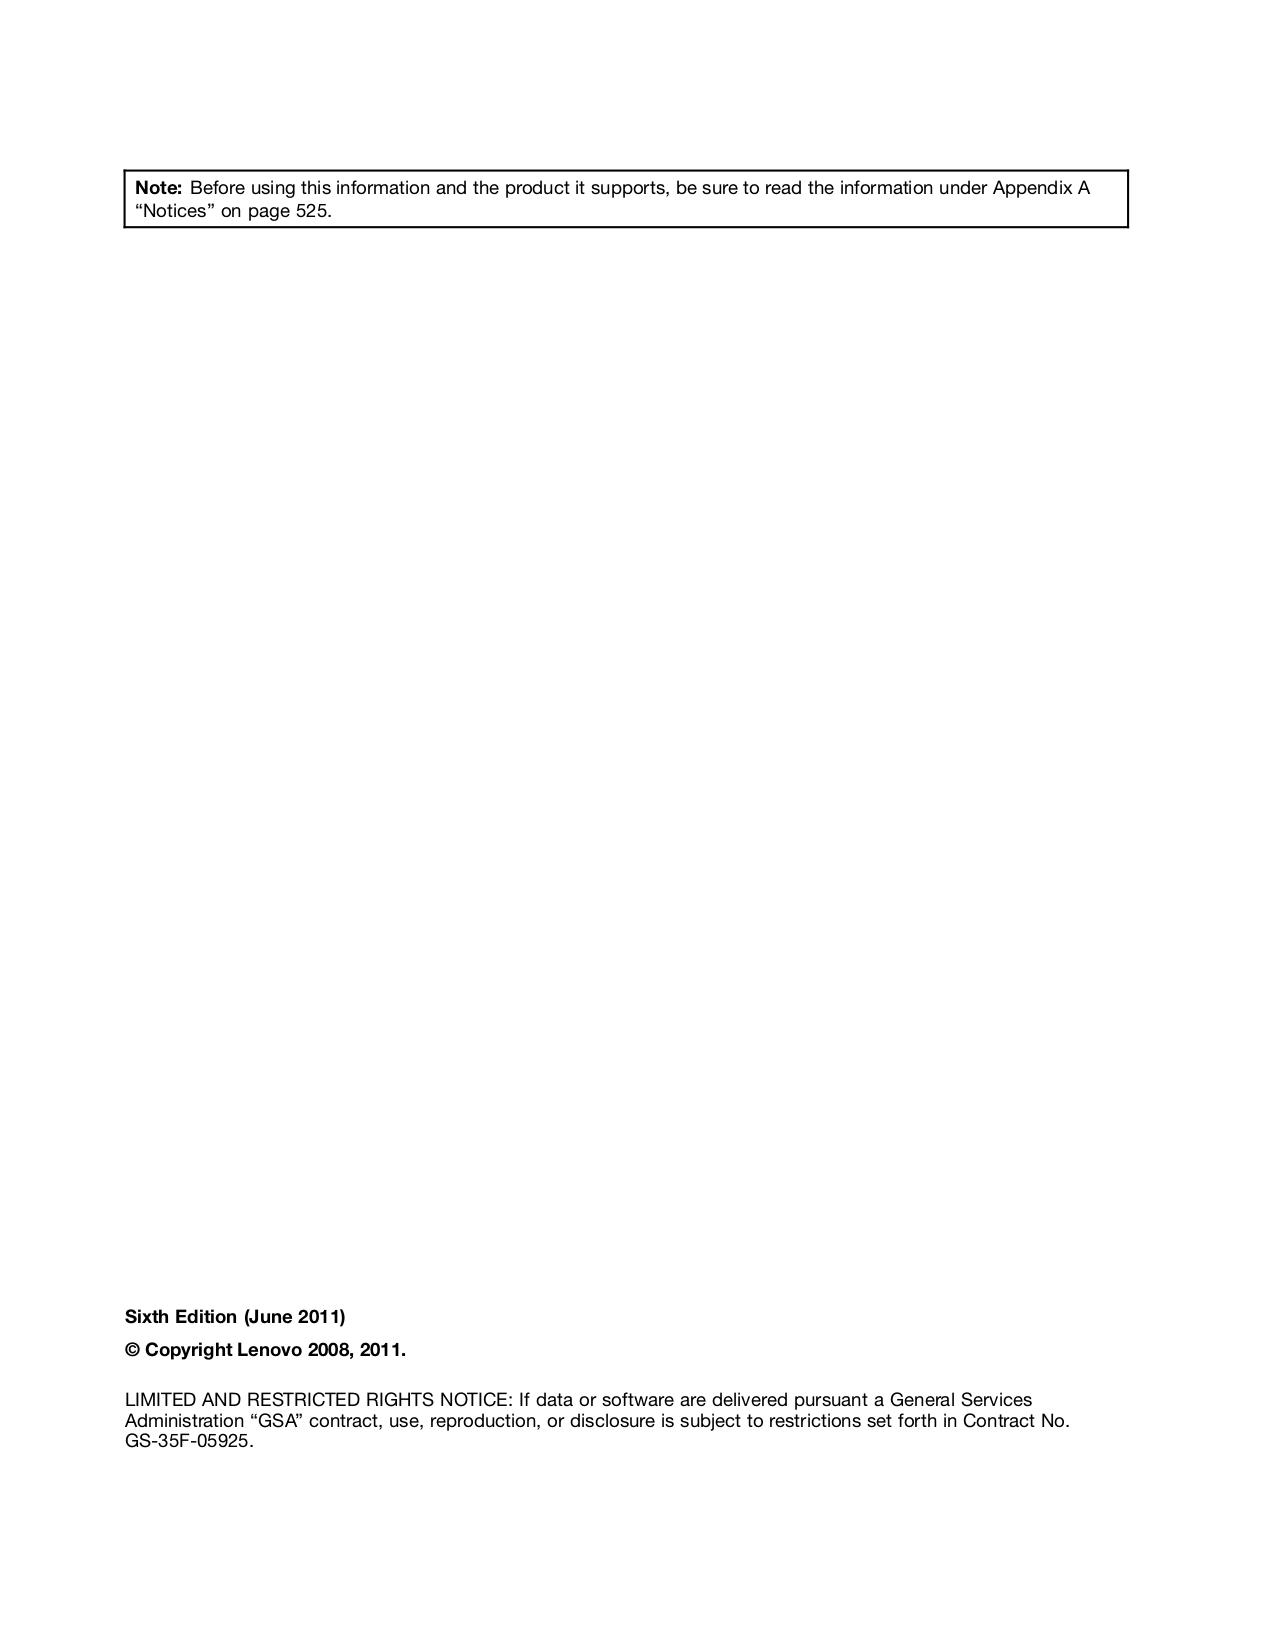 PDF manual for Lenovo Desktop ThinkCentre M58e 7303